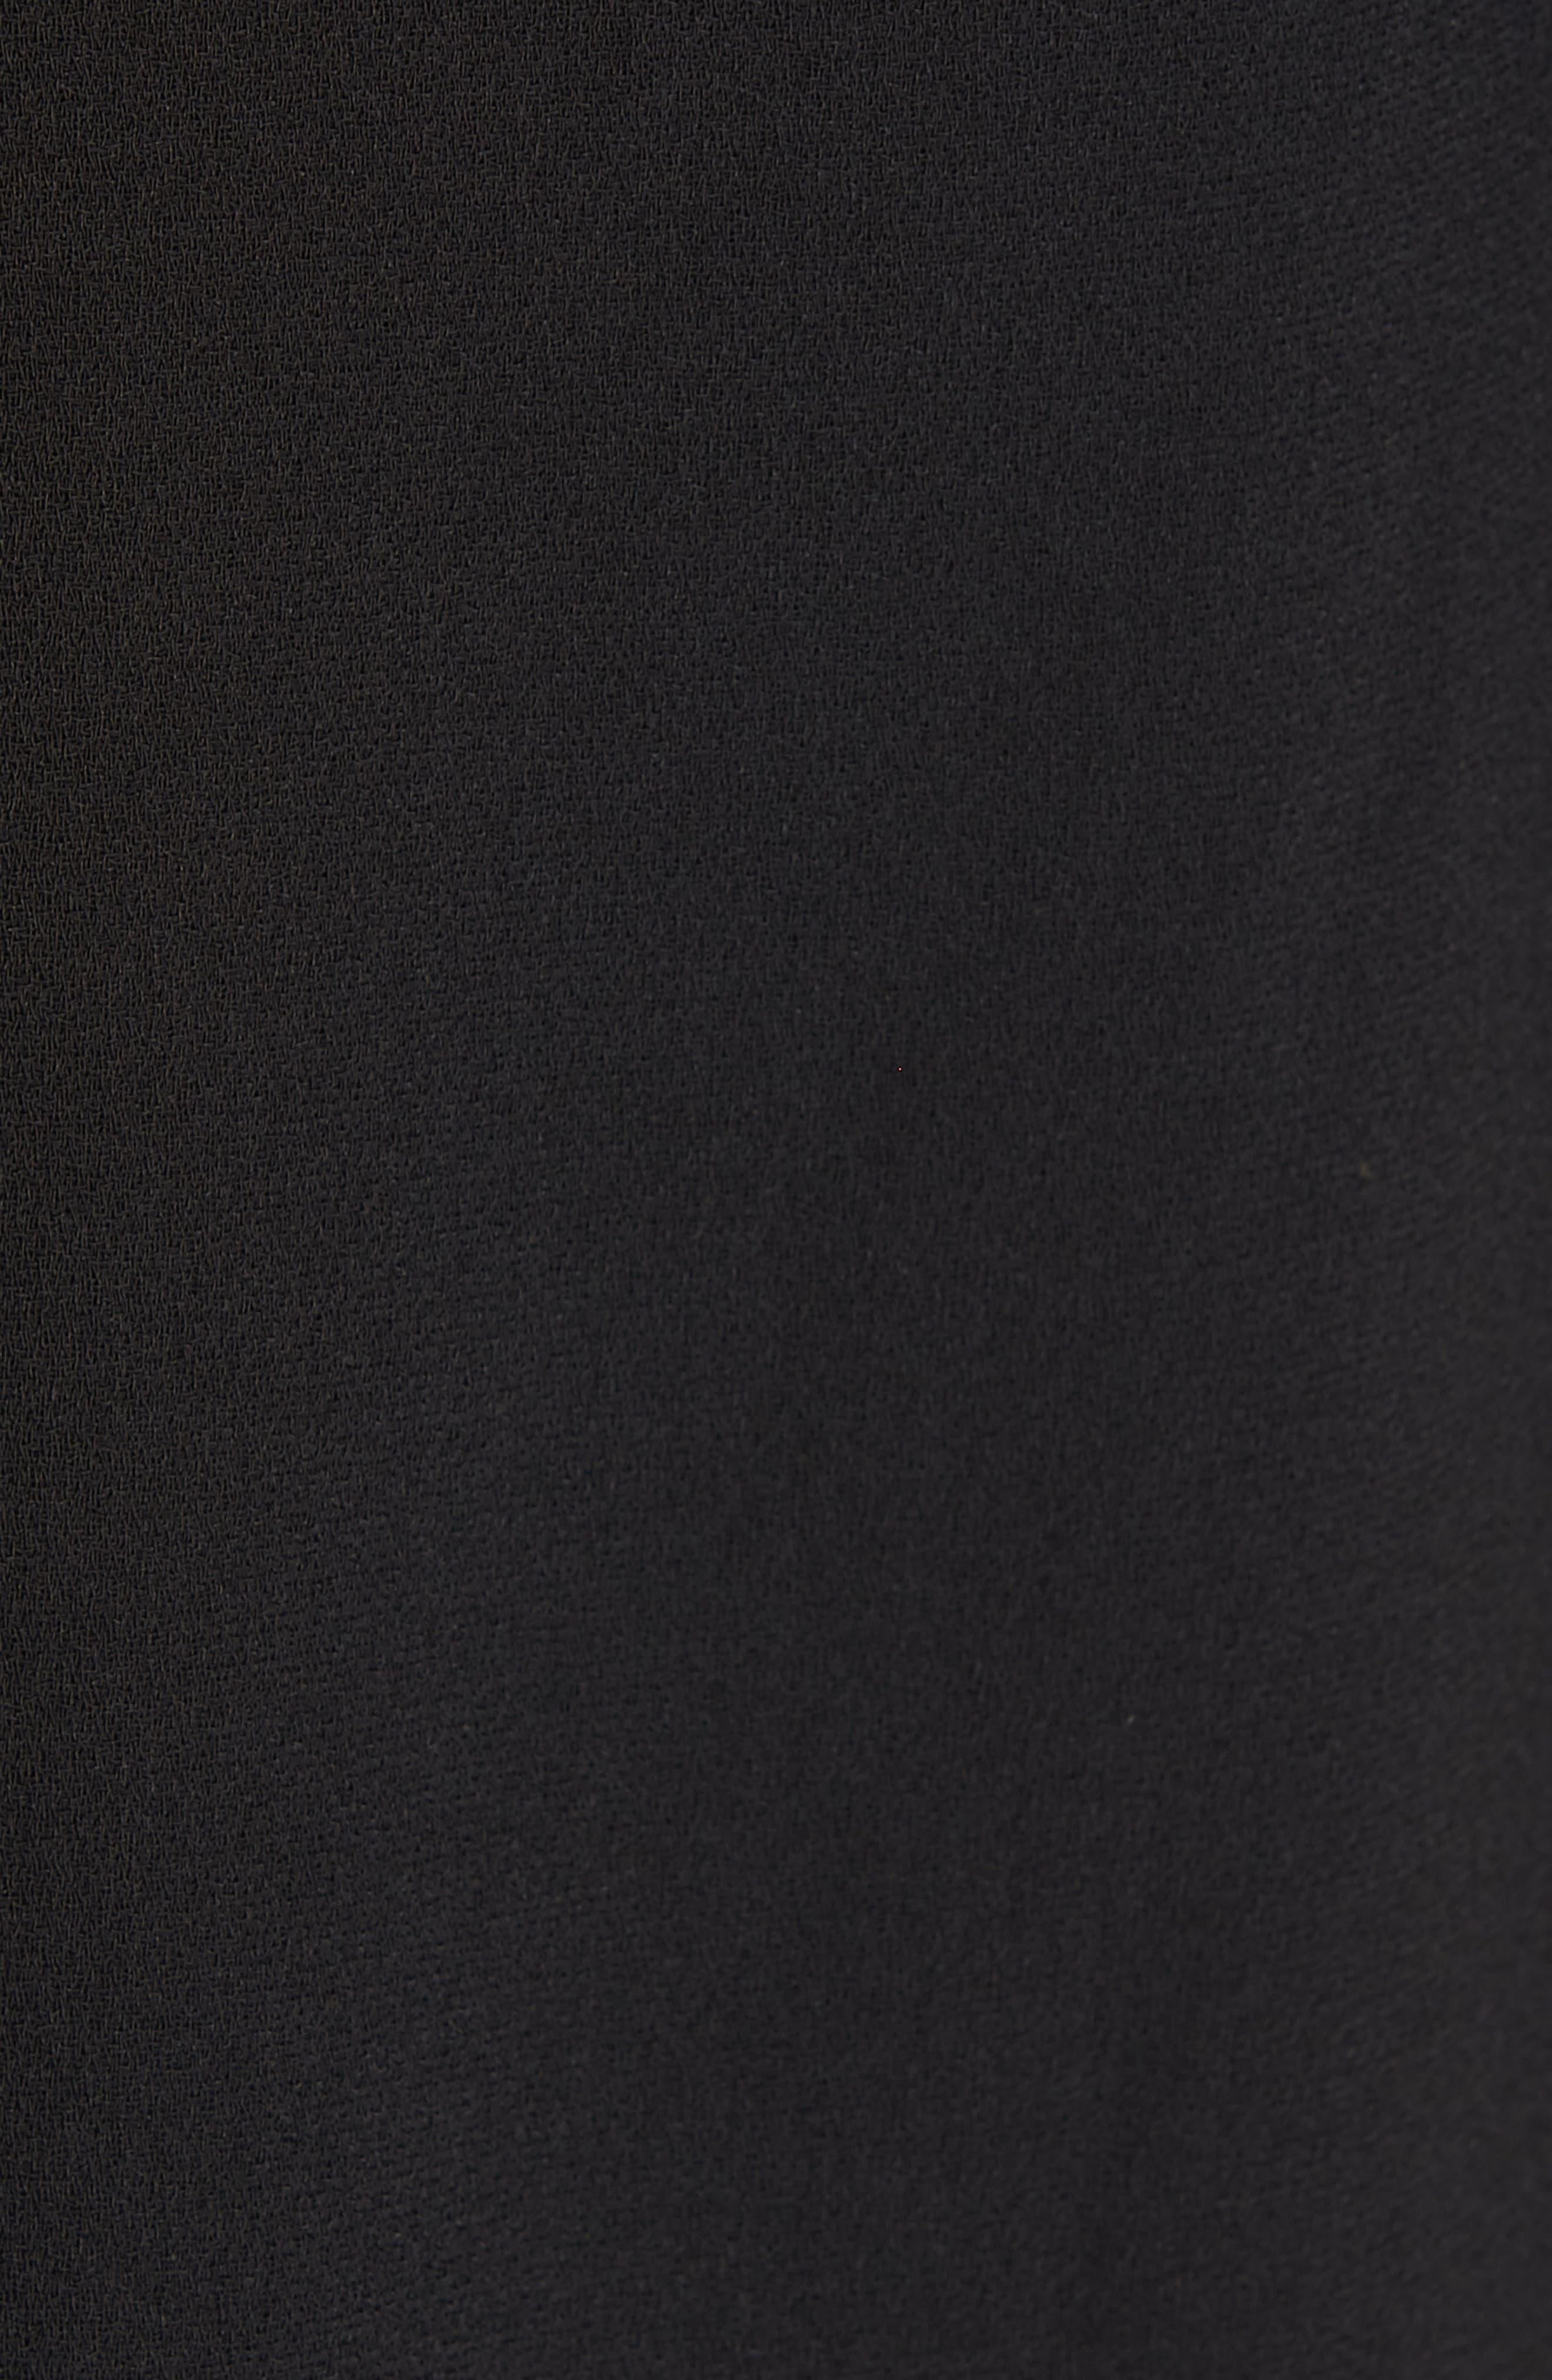 Lace Panel Bell Sleeve Tunic Dress,                             Alternate thumbnail 6, color,                             BLACK